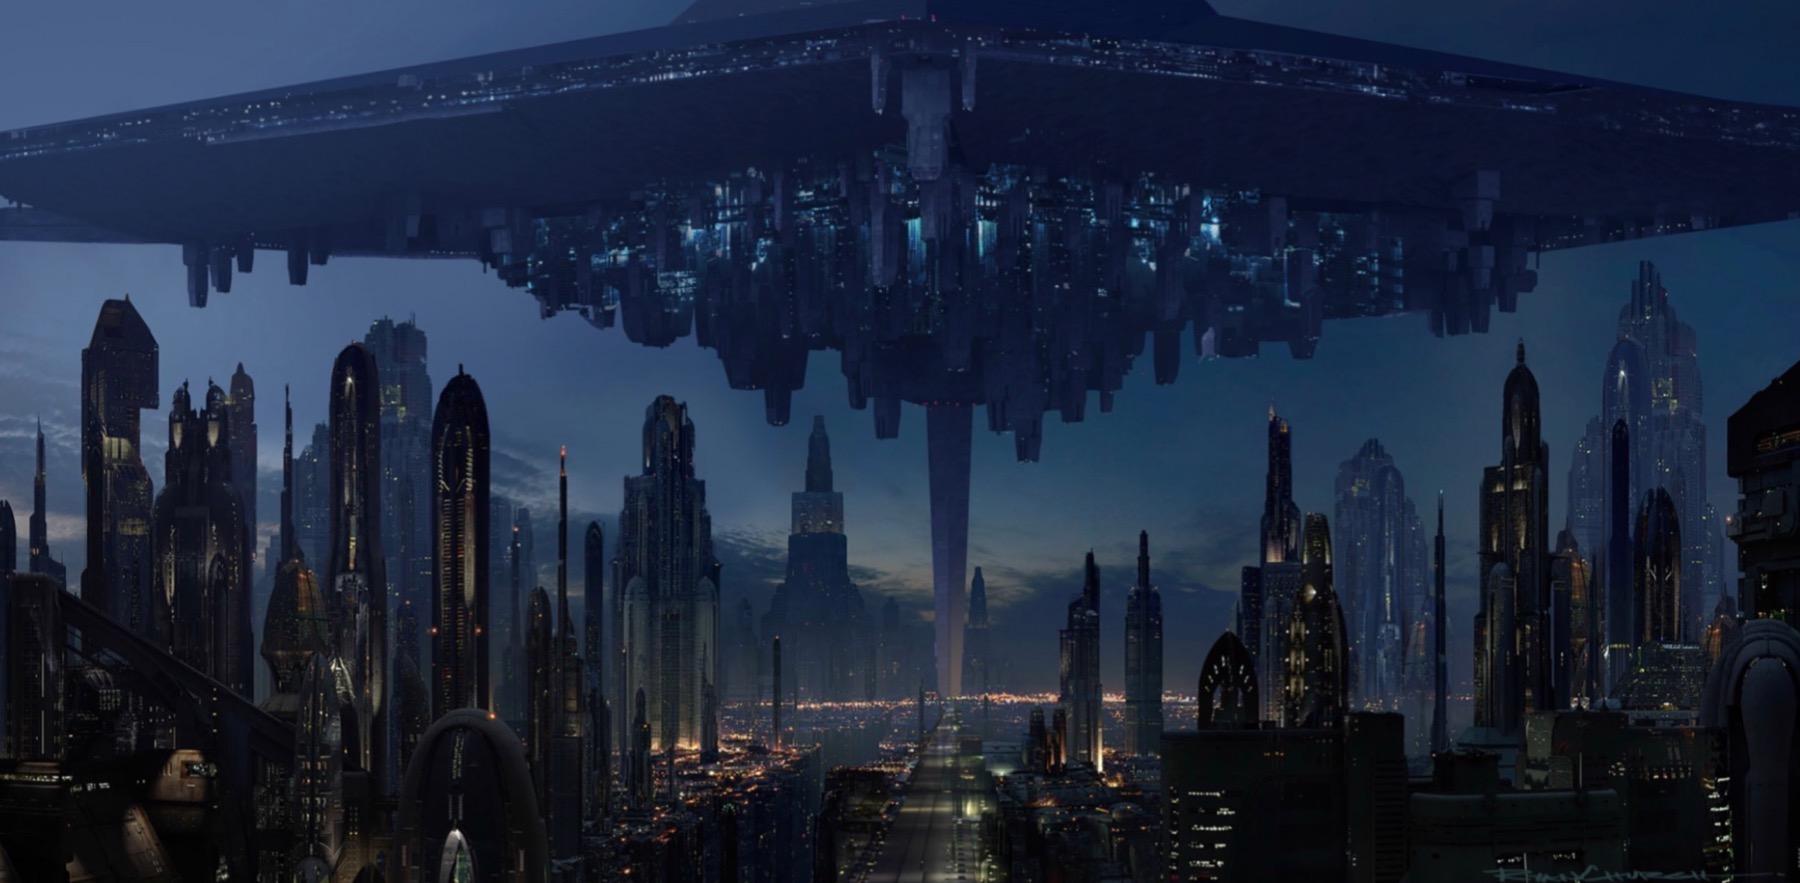 https://www.starwars-universe.com/images/actualites/episode9/conceptarts_trevorrow/08.jpg